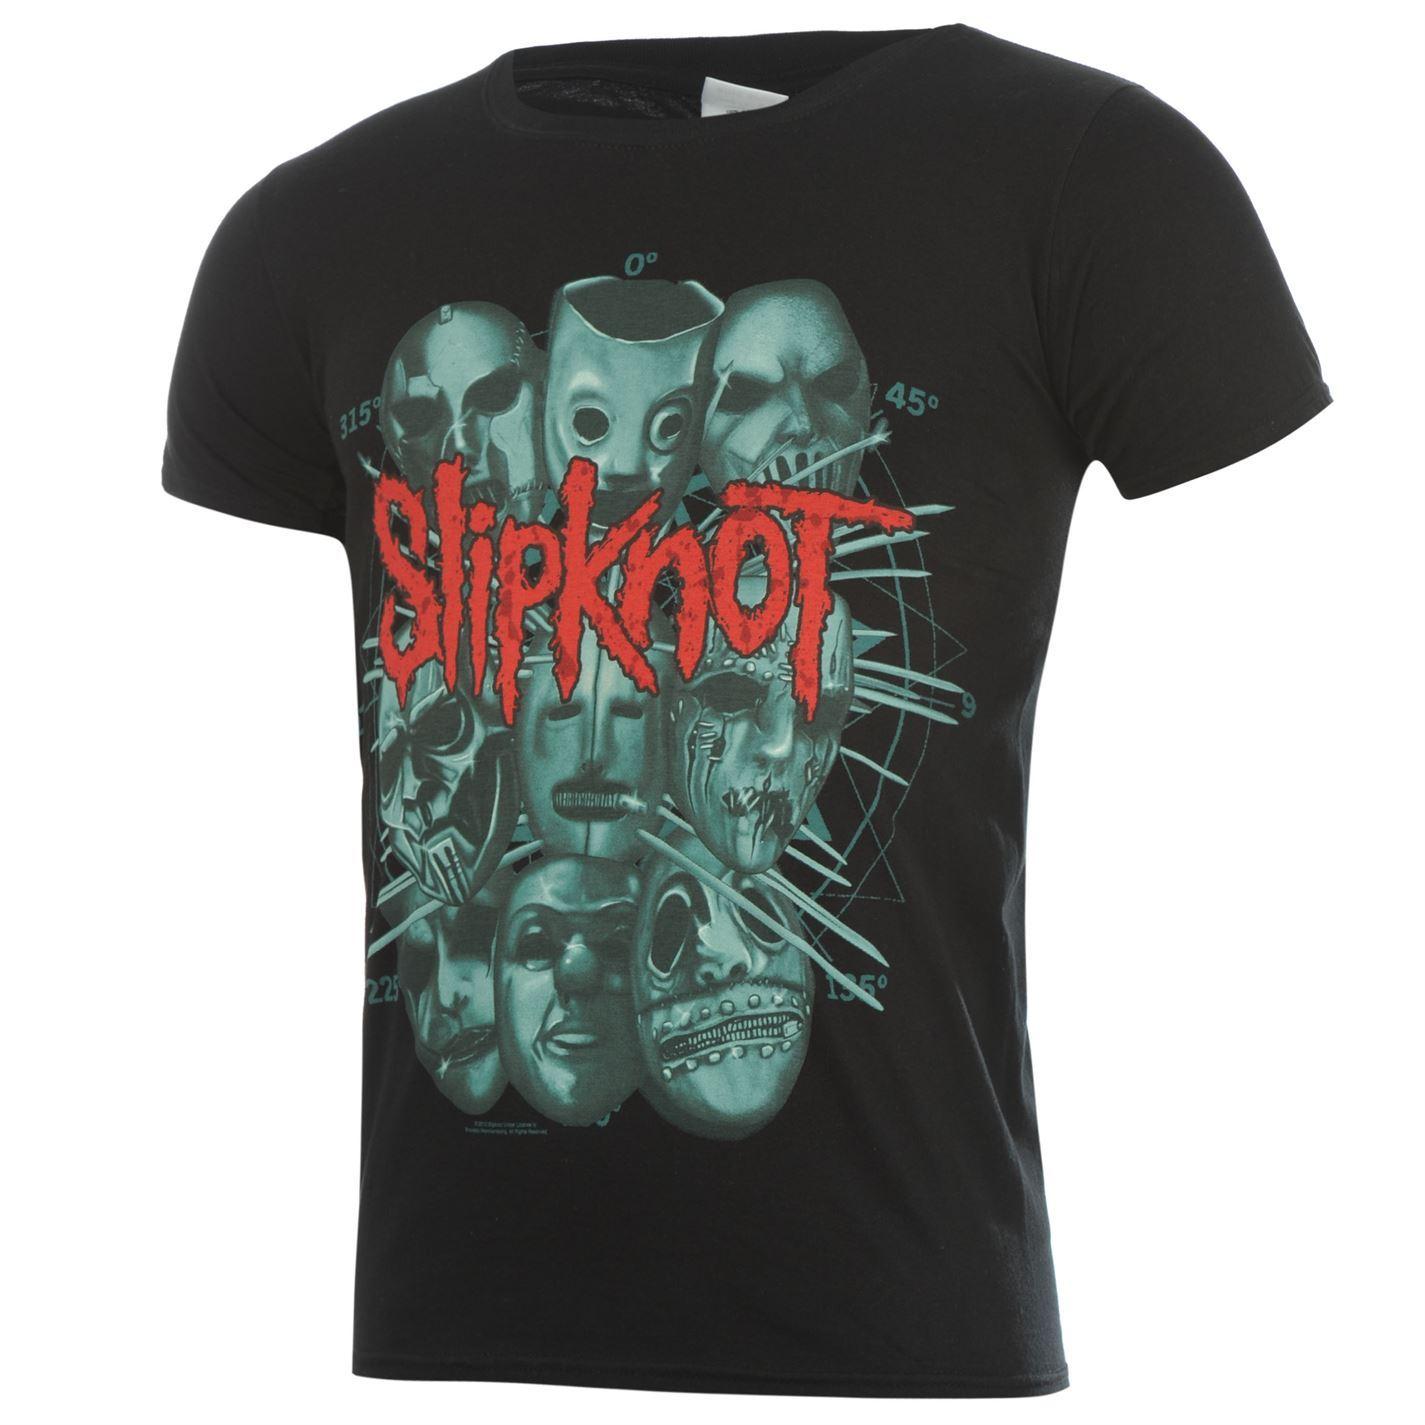 Official-Slipknot-T-Shirt-Mens-Masks-Top-Tee-Tshirt thumbnail 9